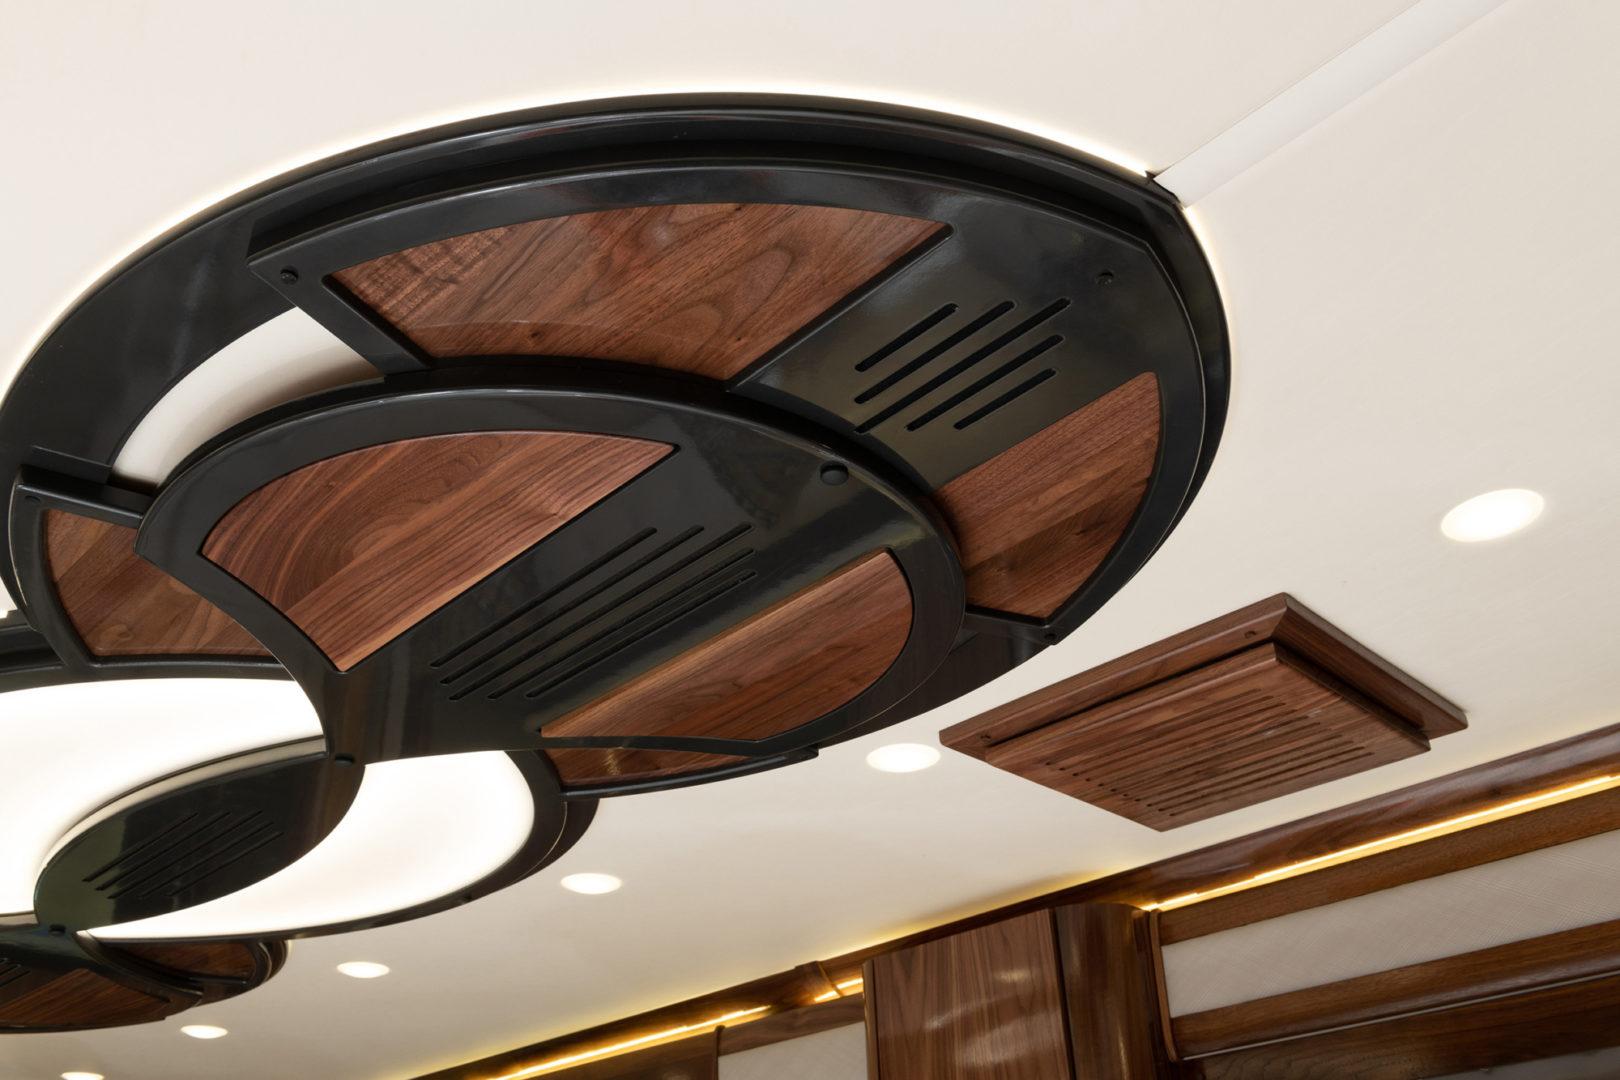 Ceilingtreatment eagle45k blkwalnut4969